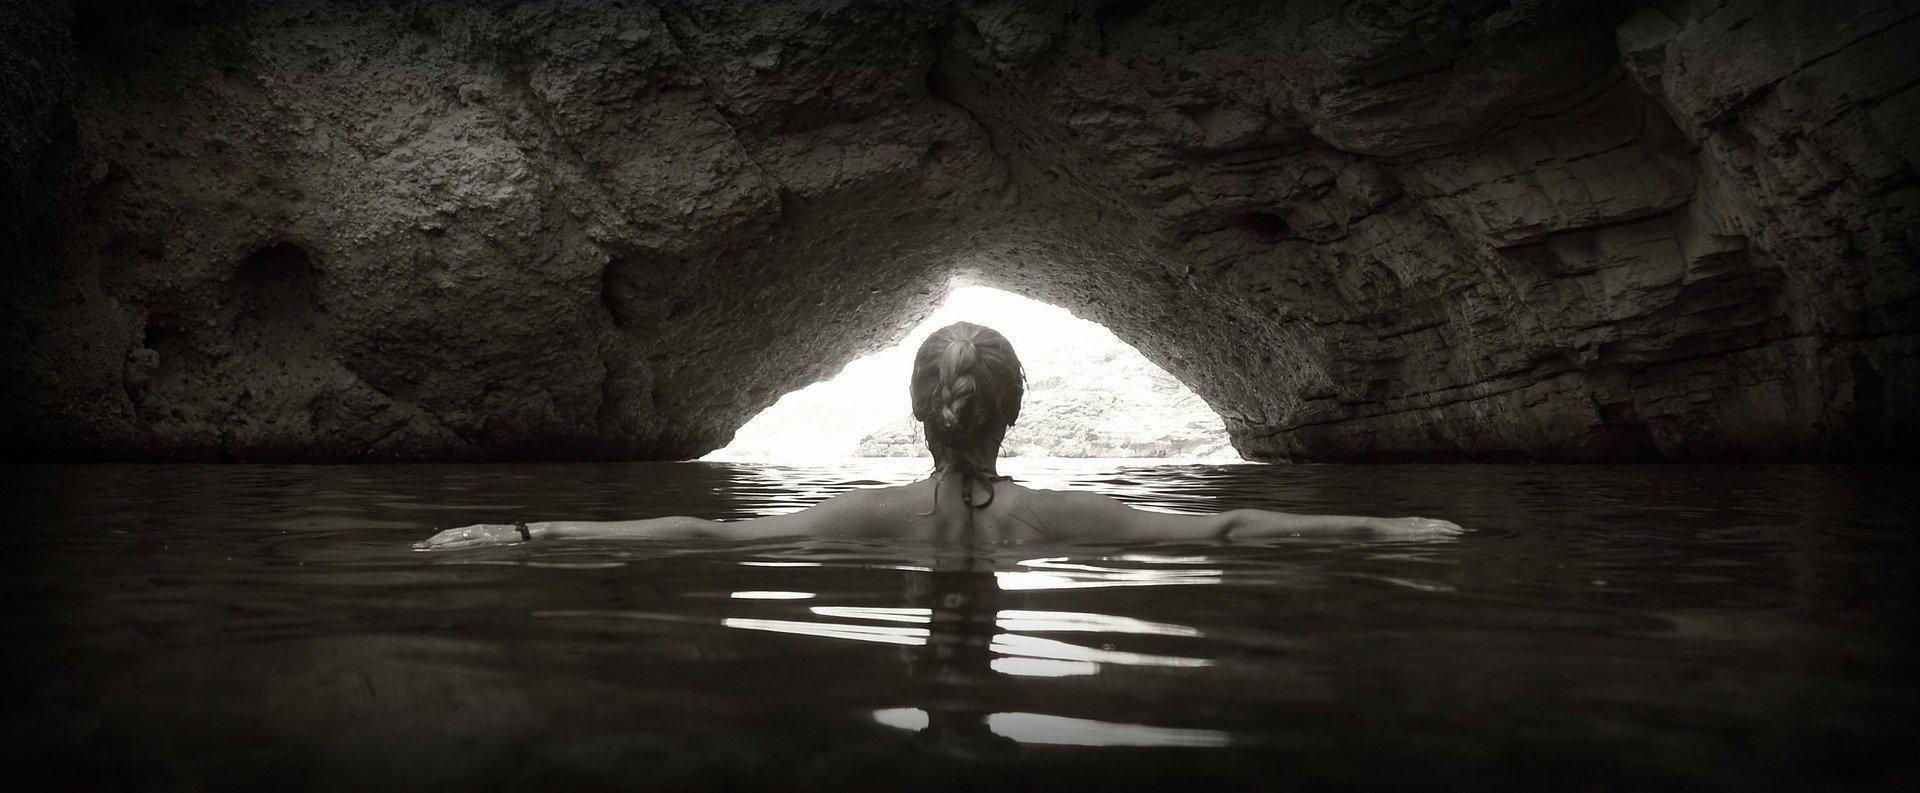 grotto-985590_1920